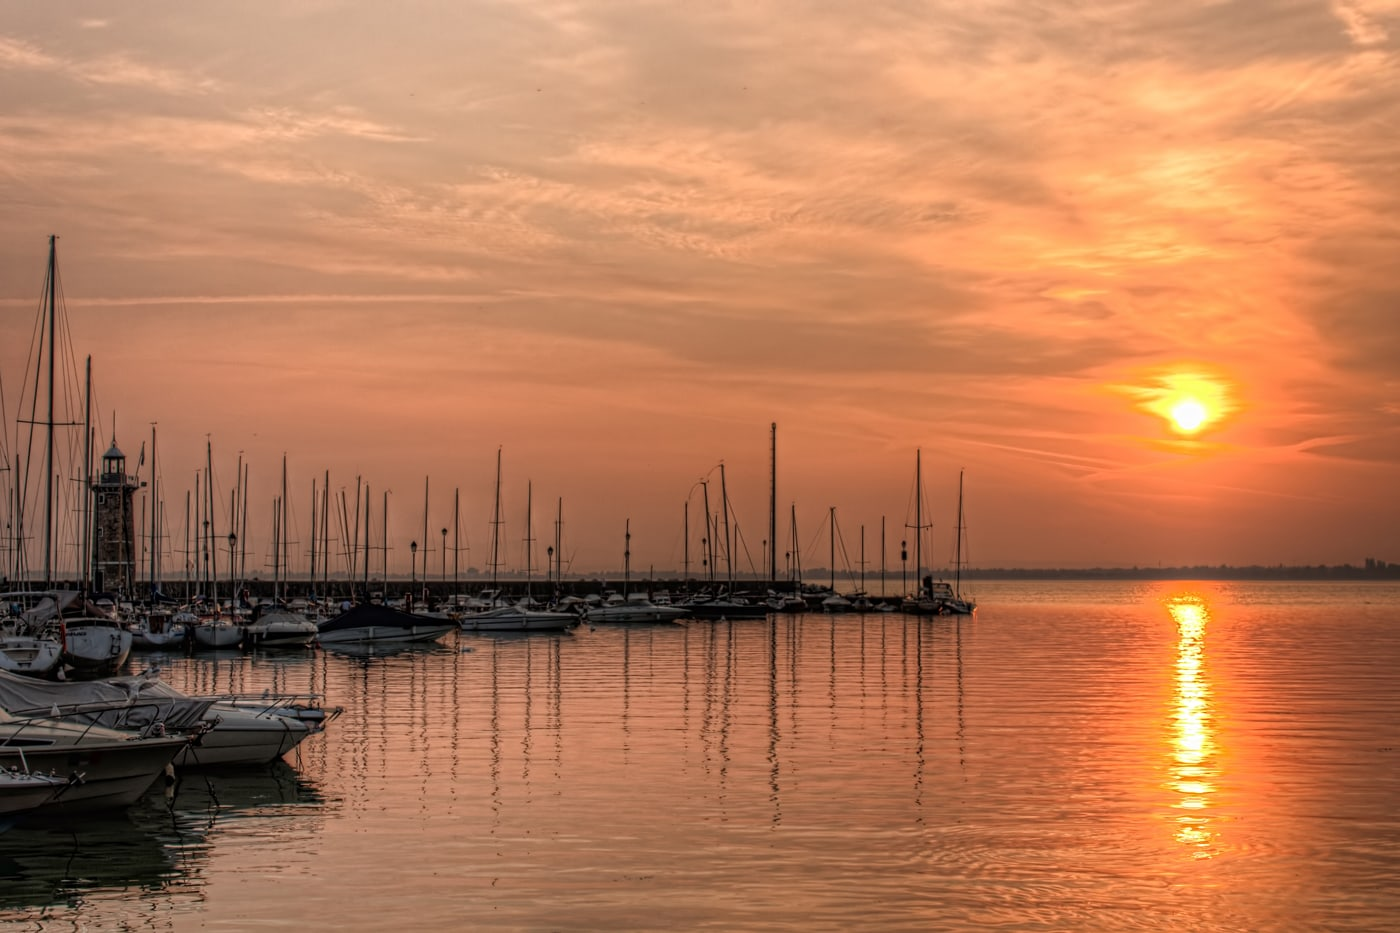 Sonnenaufgang am Hafen in Desenzano del Garda